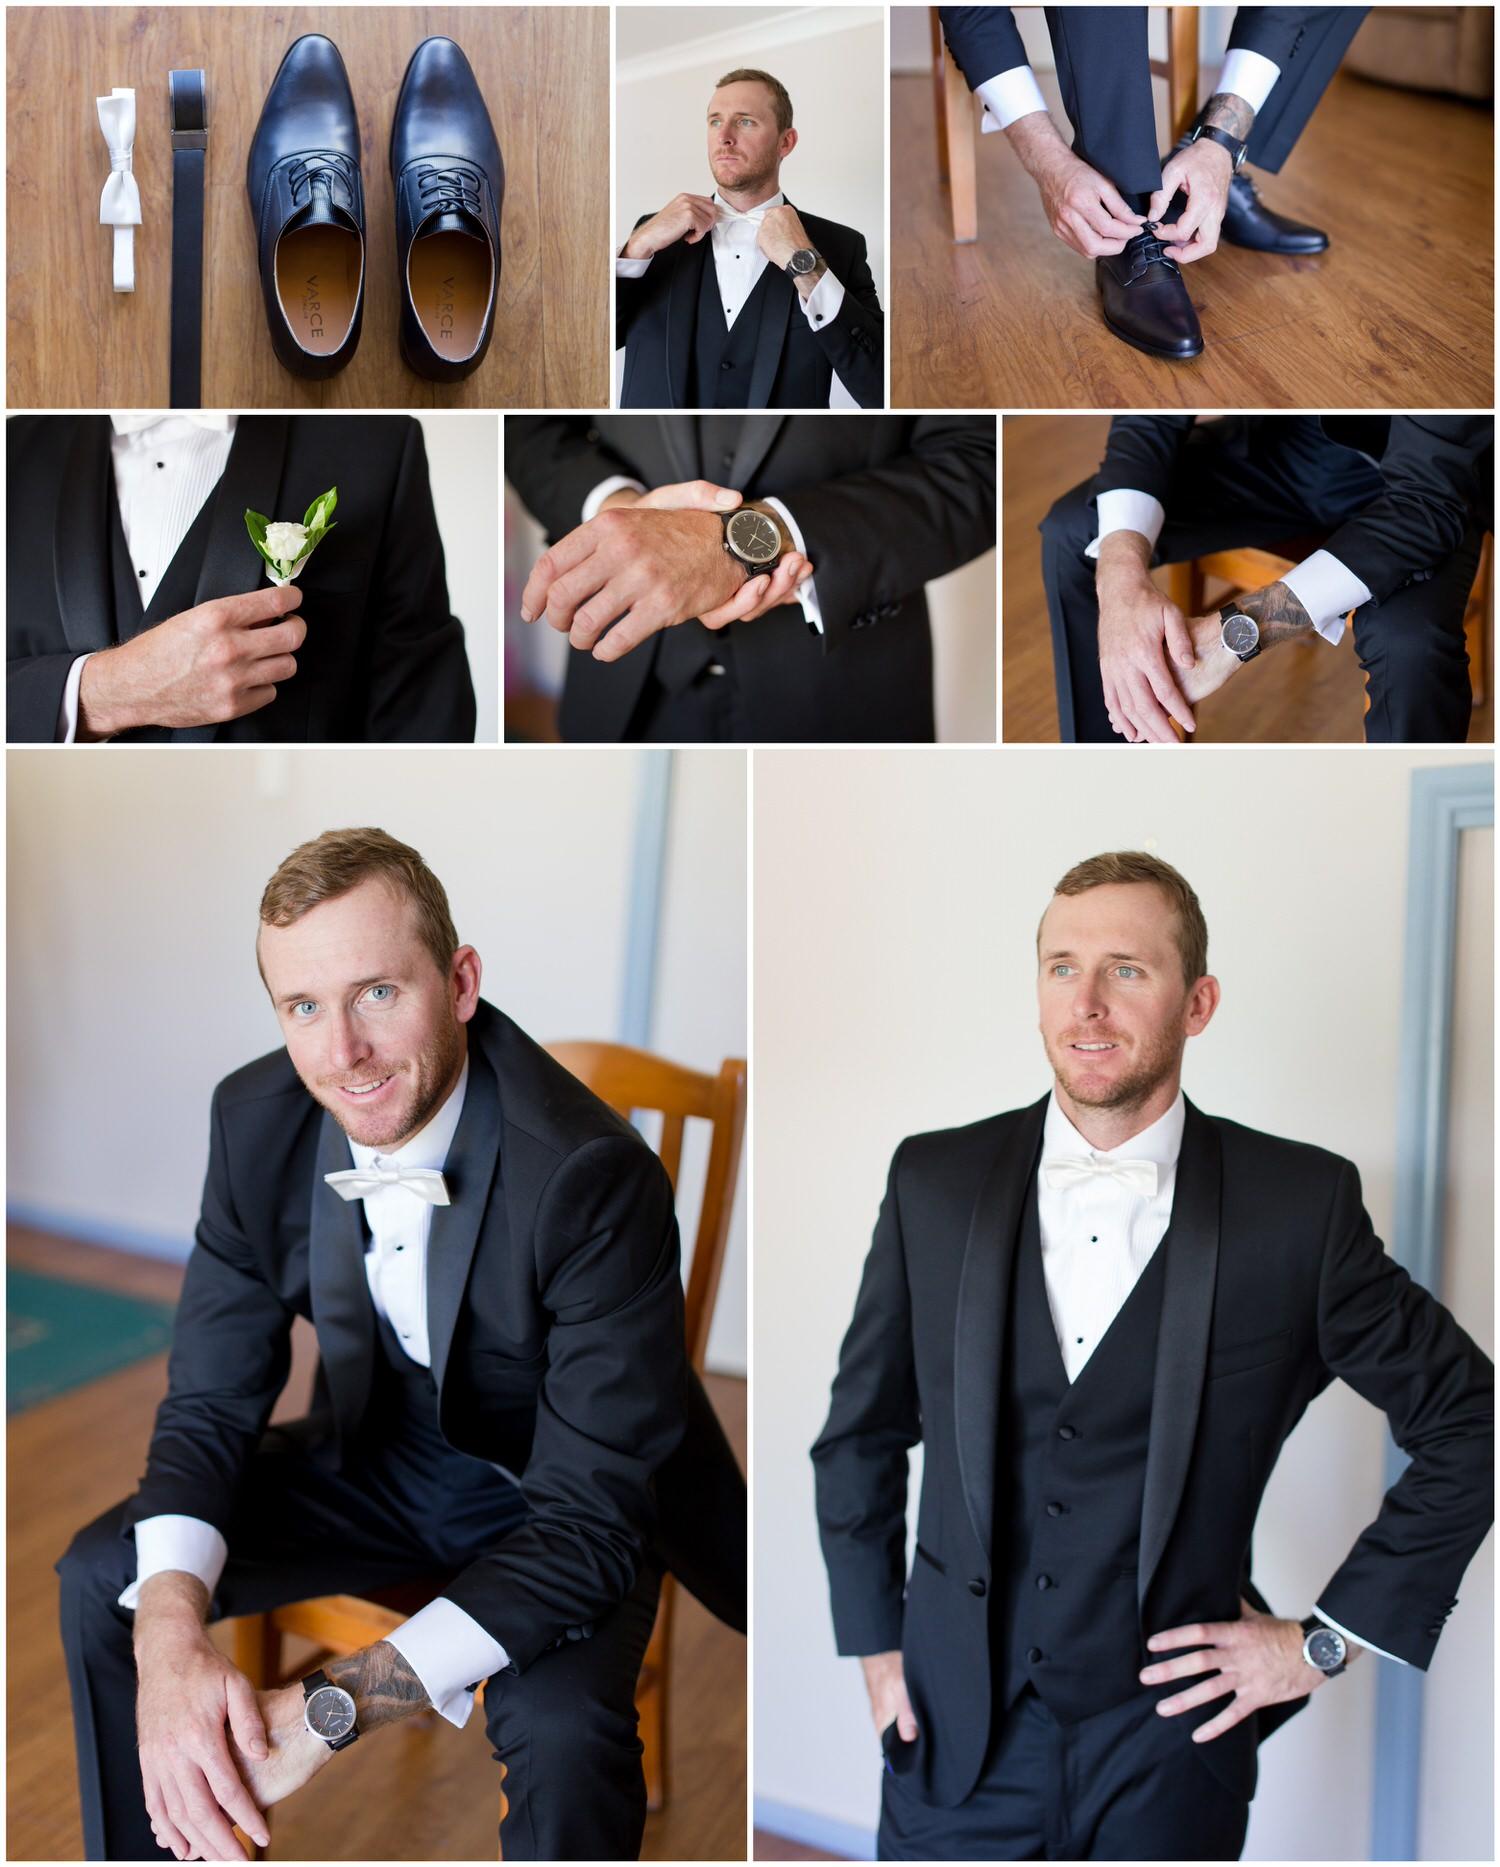 Dubbo Wedding Photography - Lazy River Estate Wedding 1